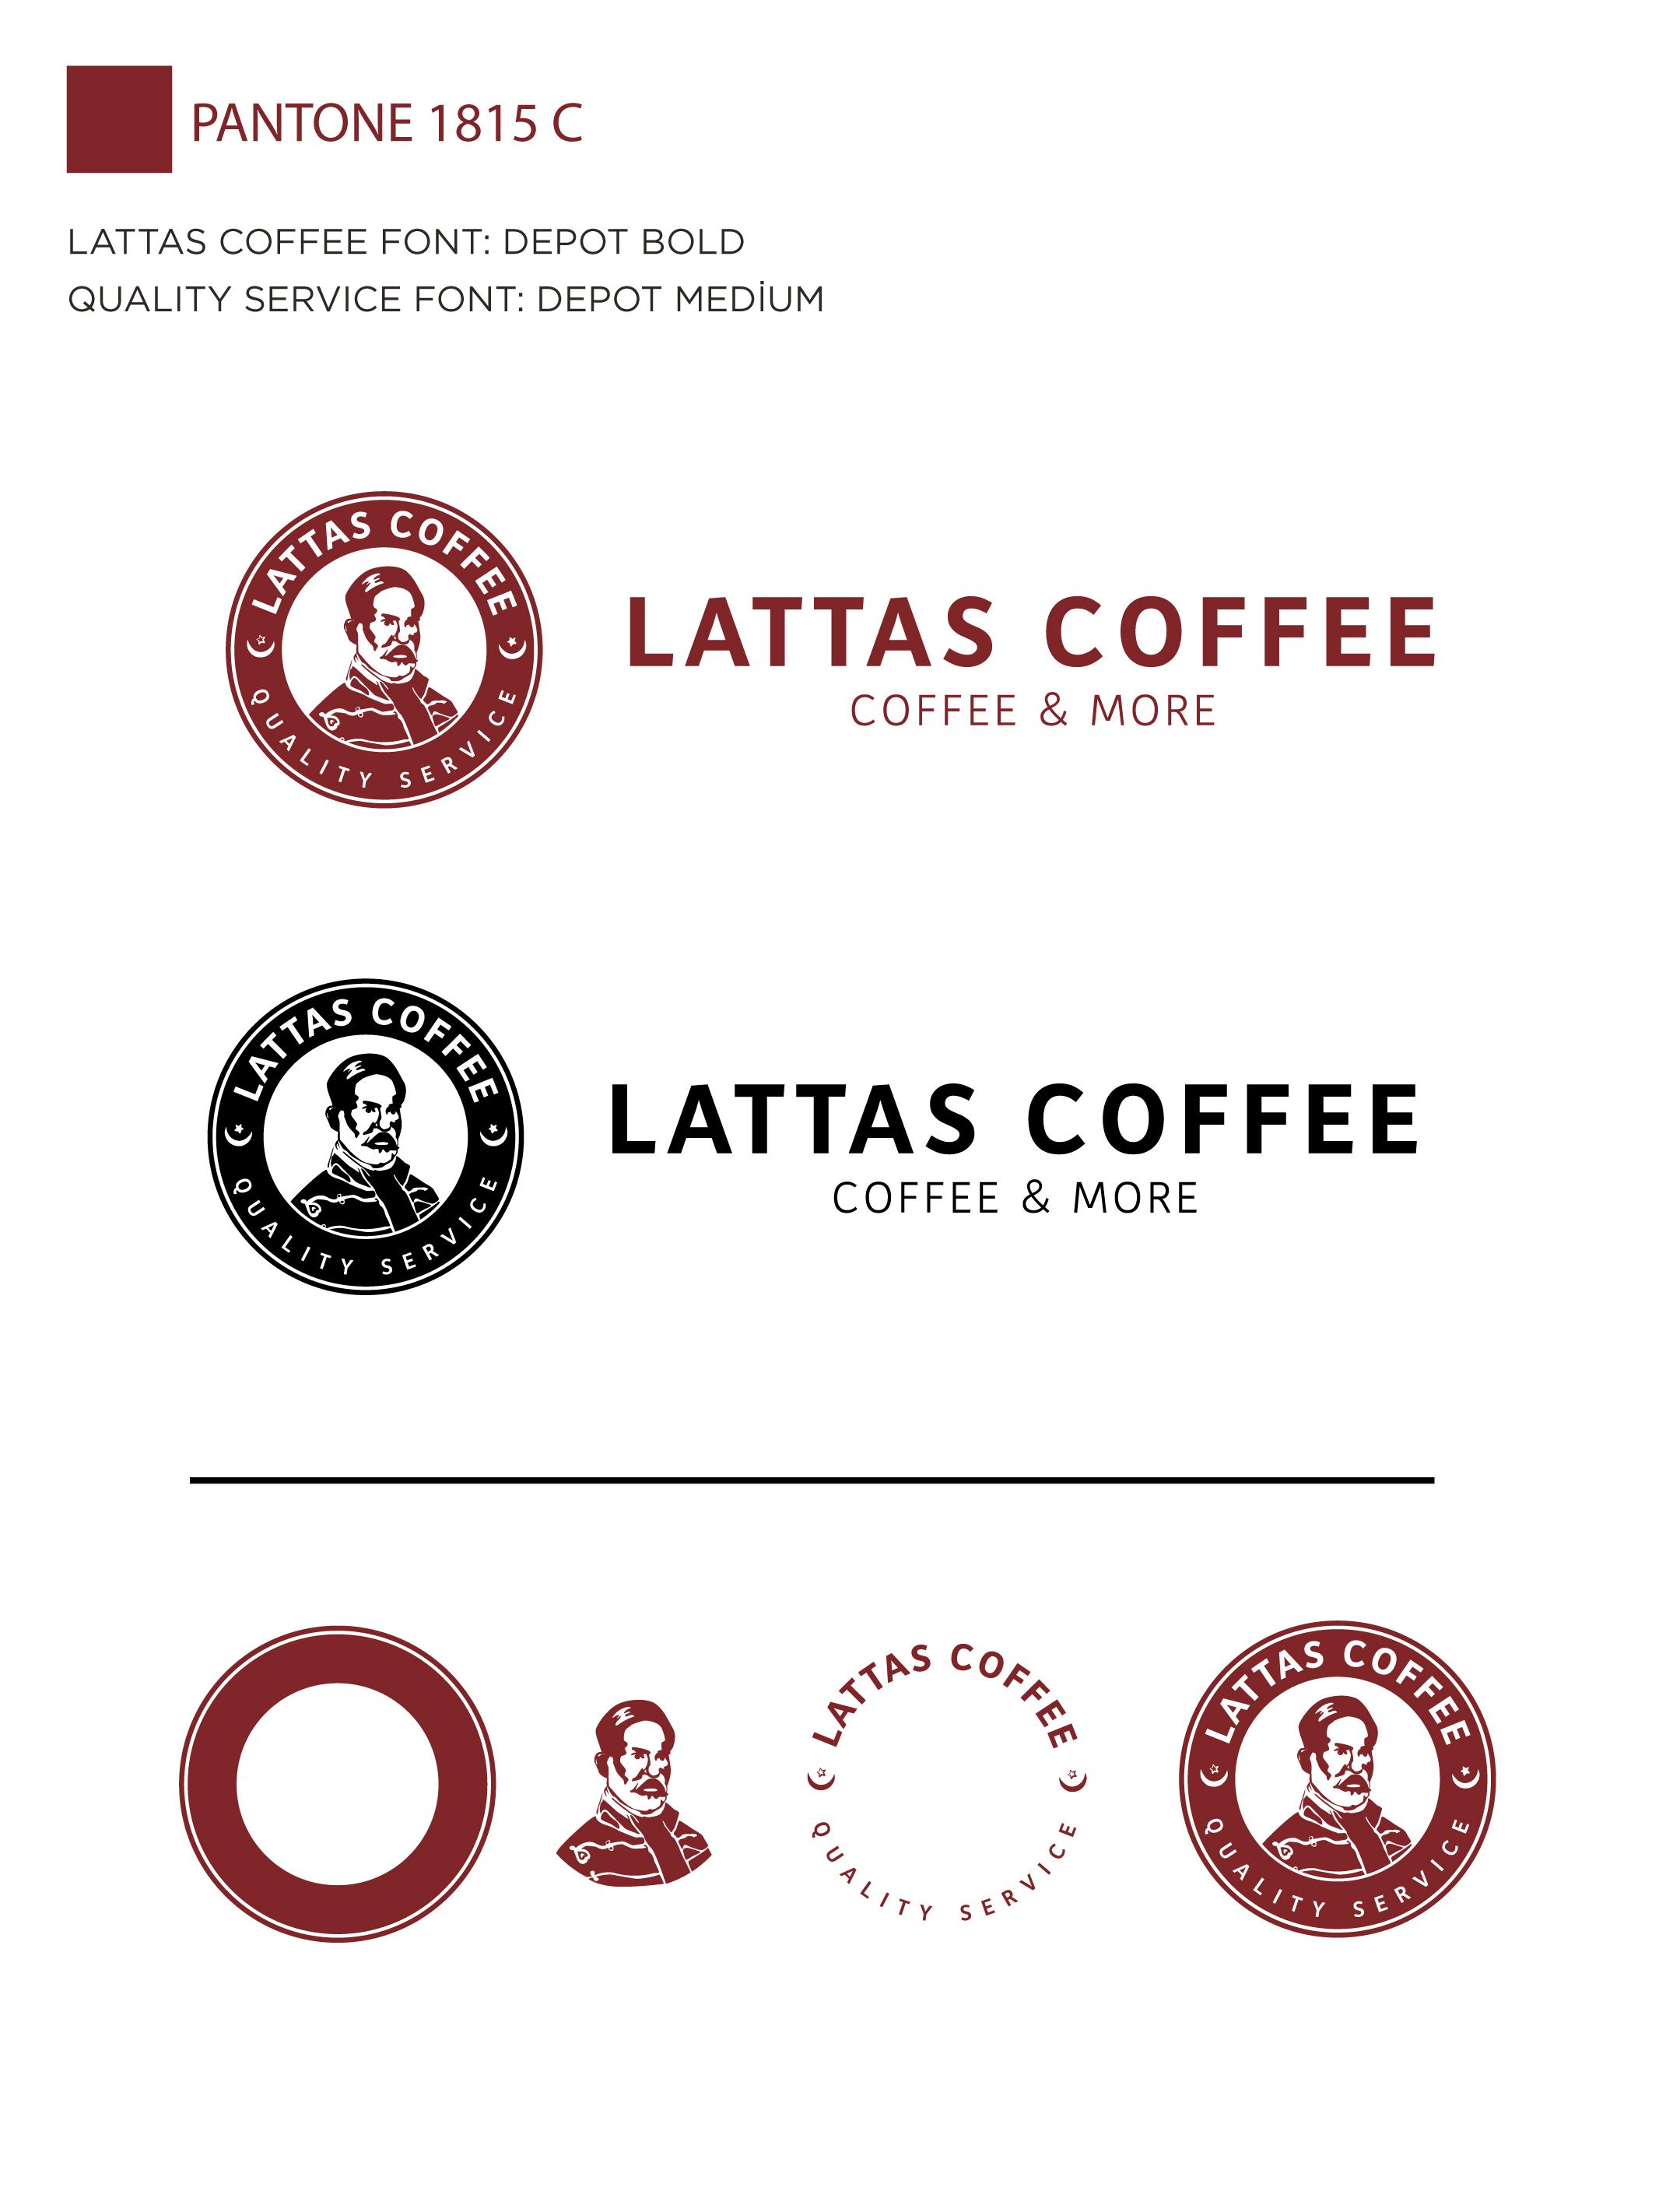 Nar_Turizm_13_lattas_coffee_logo_tasarimi